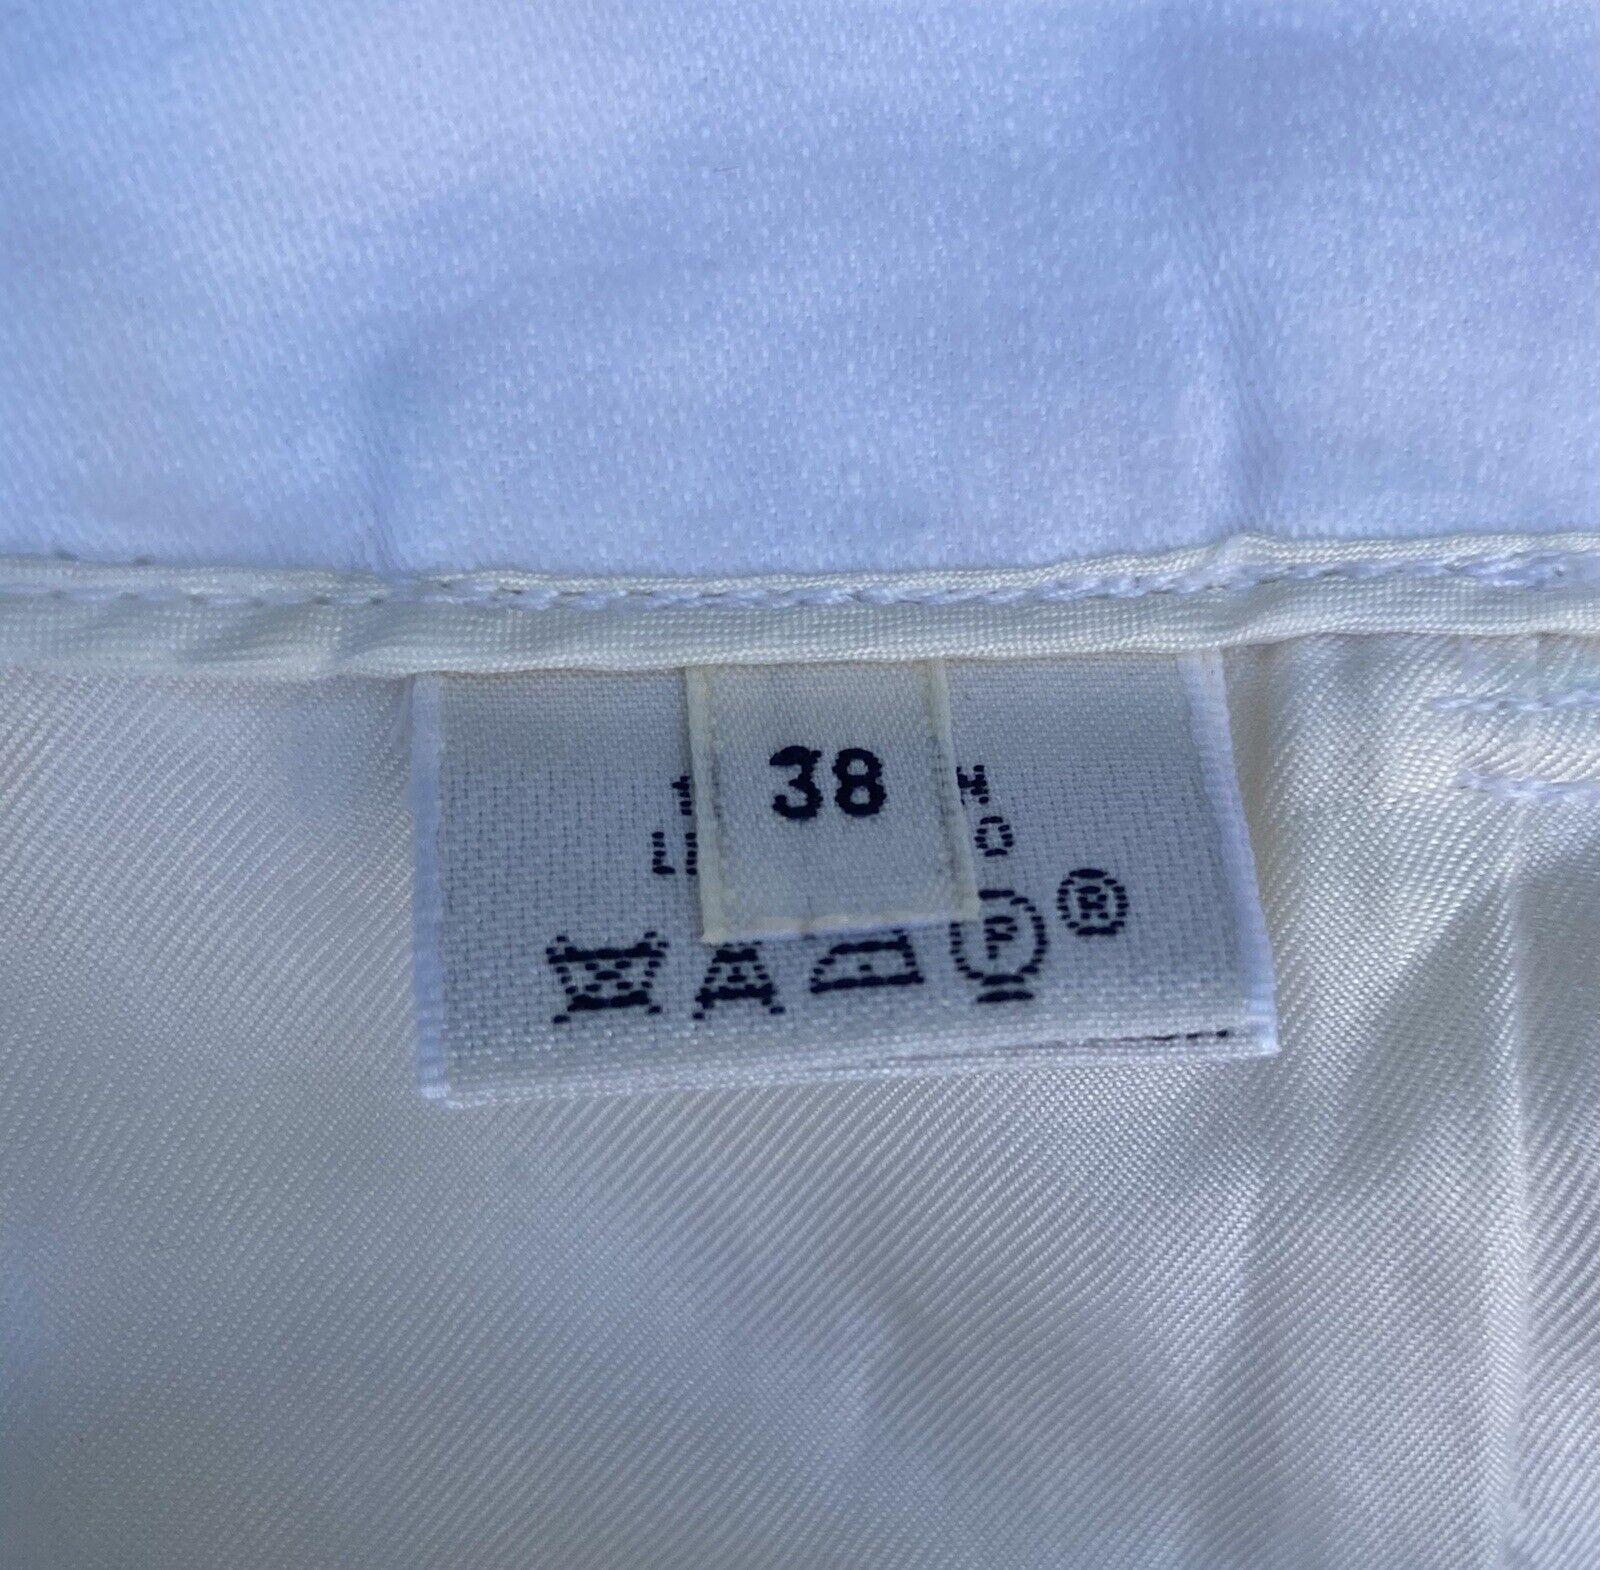 Vintage Hermes Linen Suit 36 - image 8